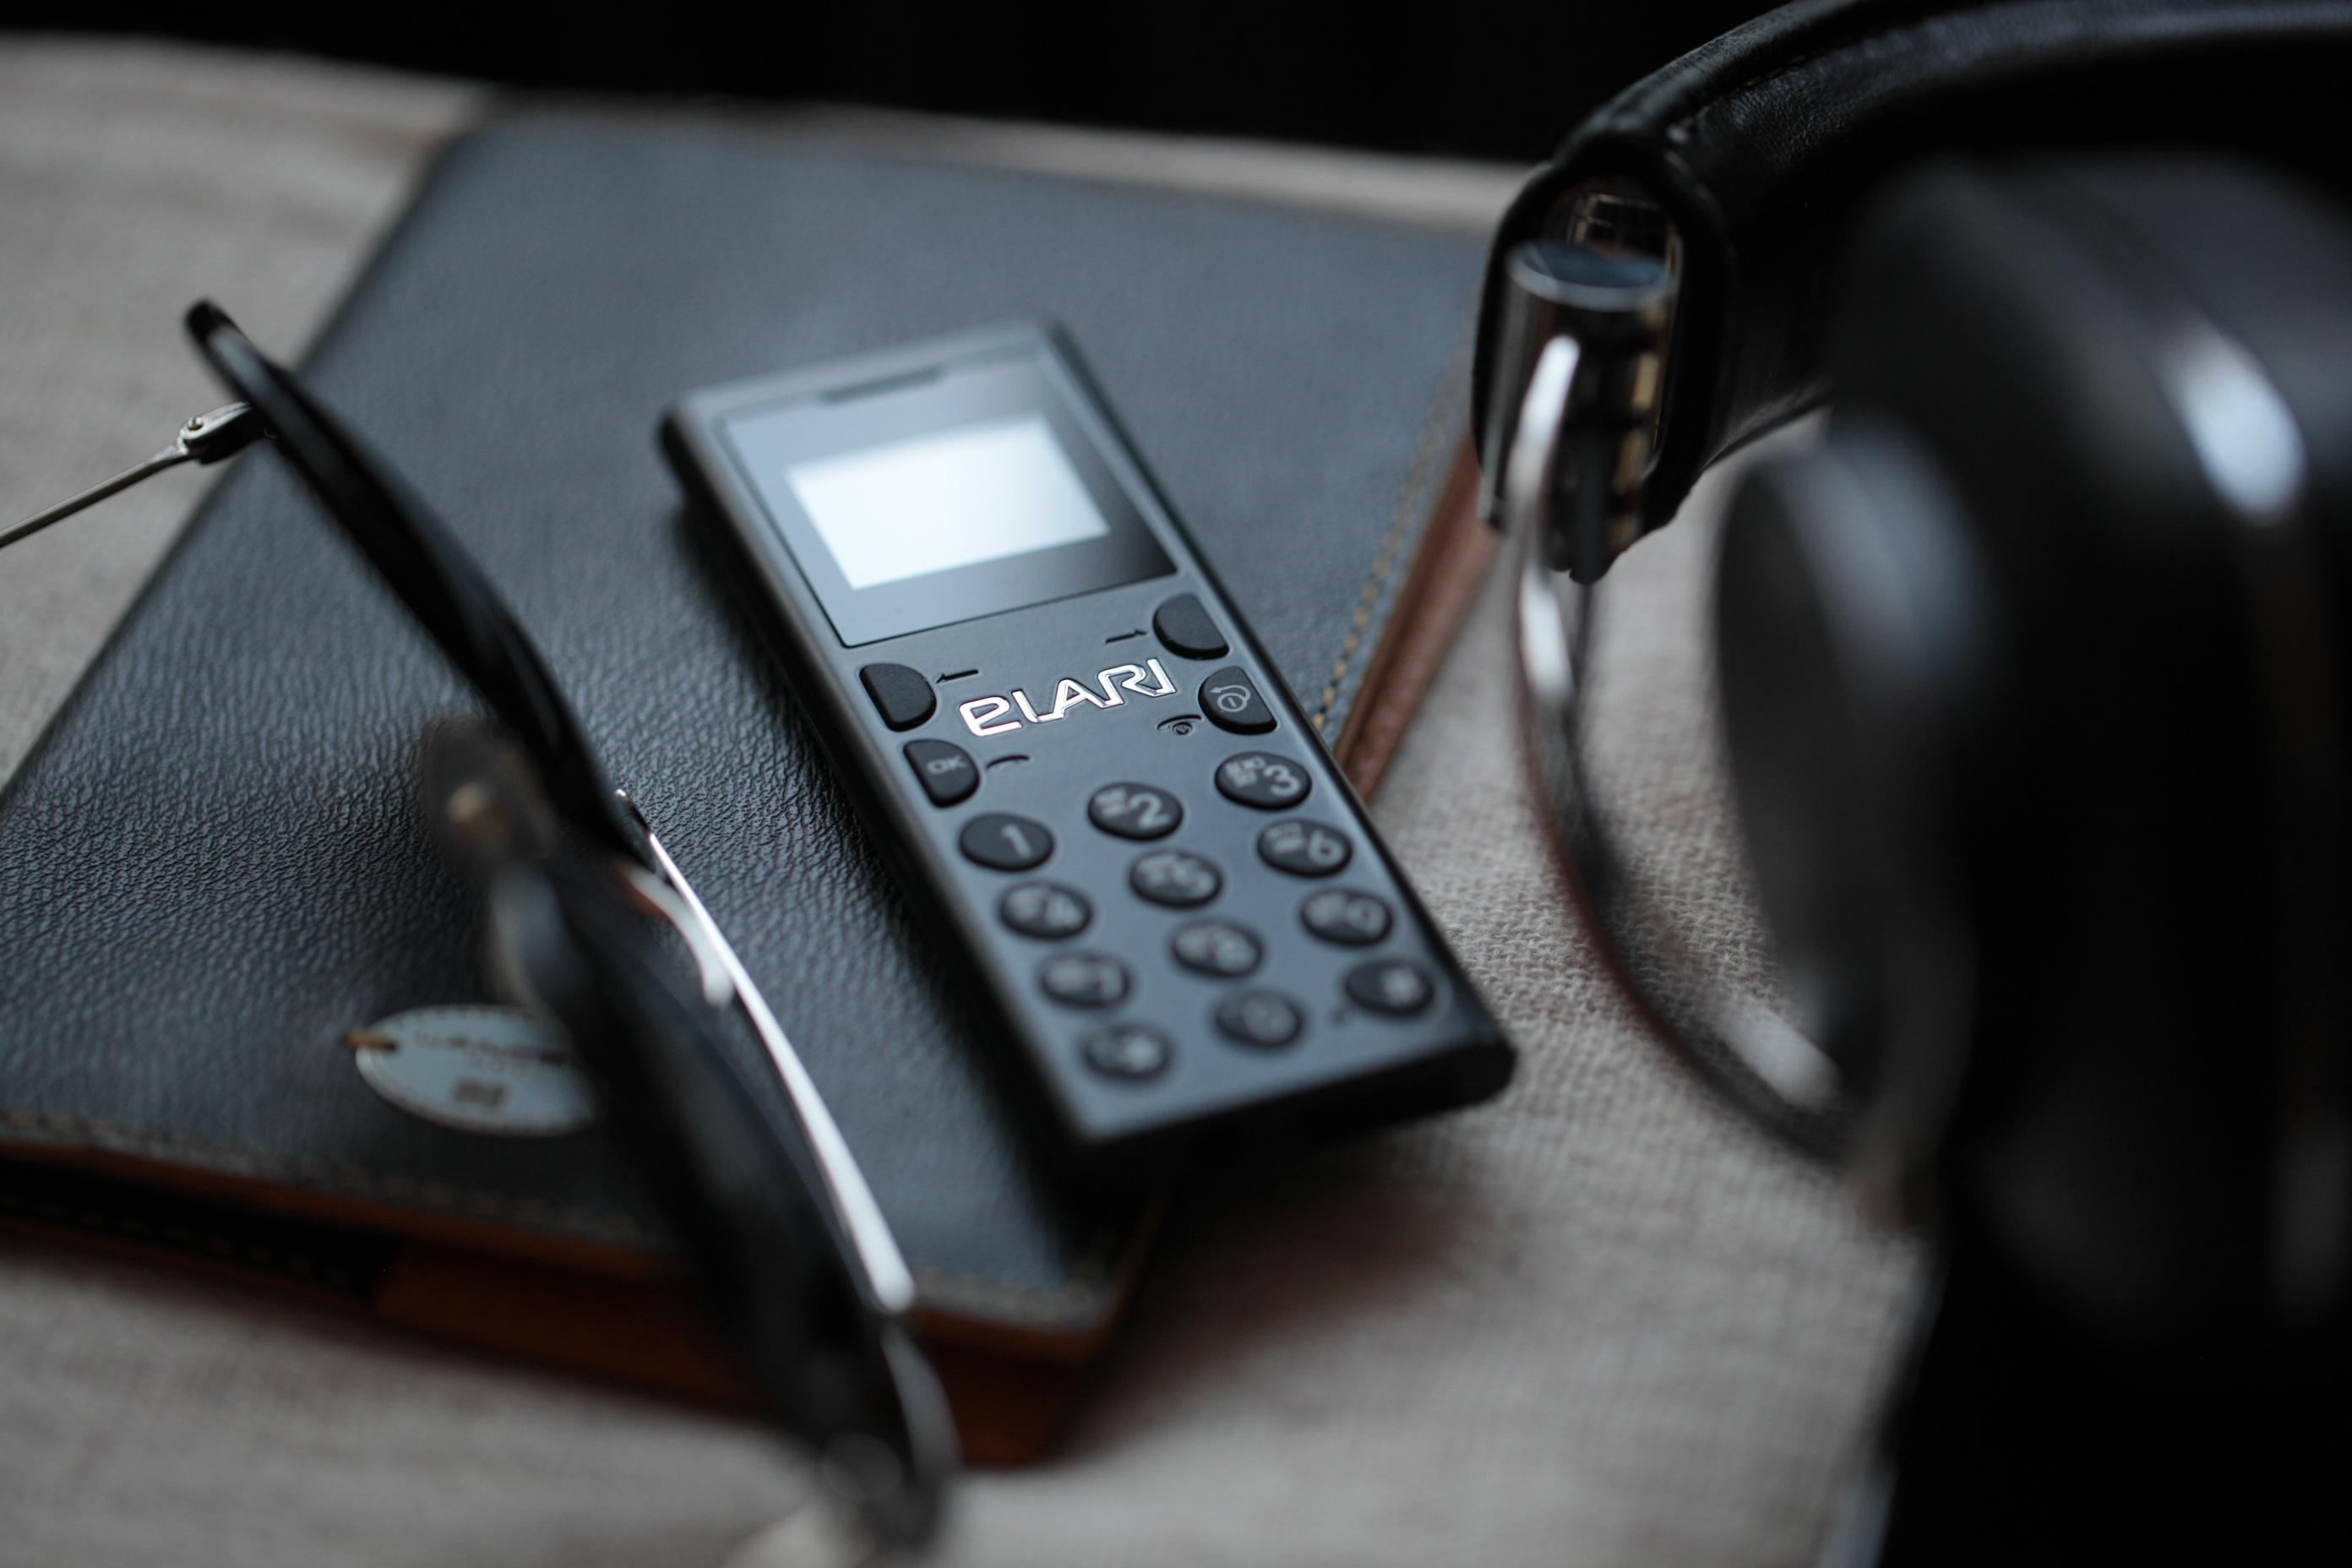 Elari Nanophone C phone in india